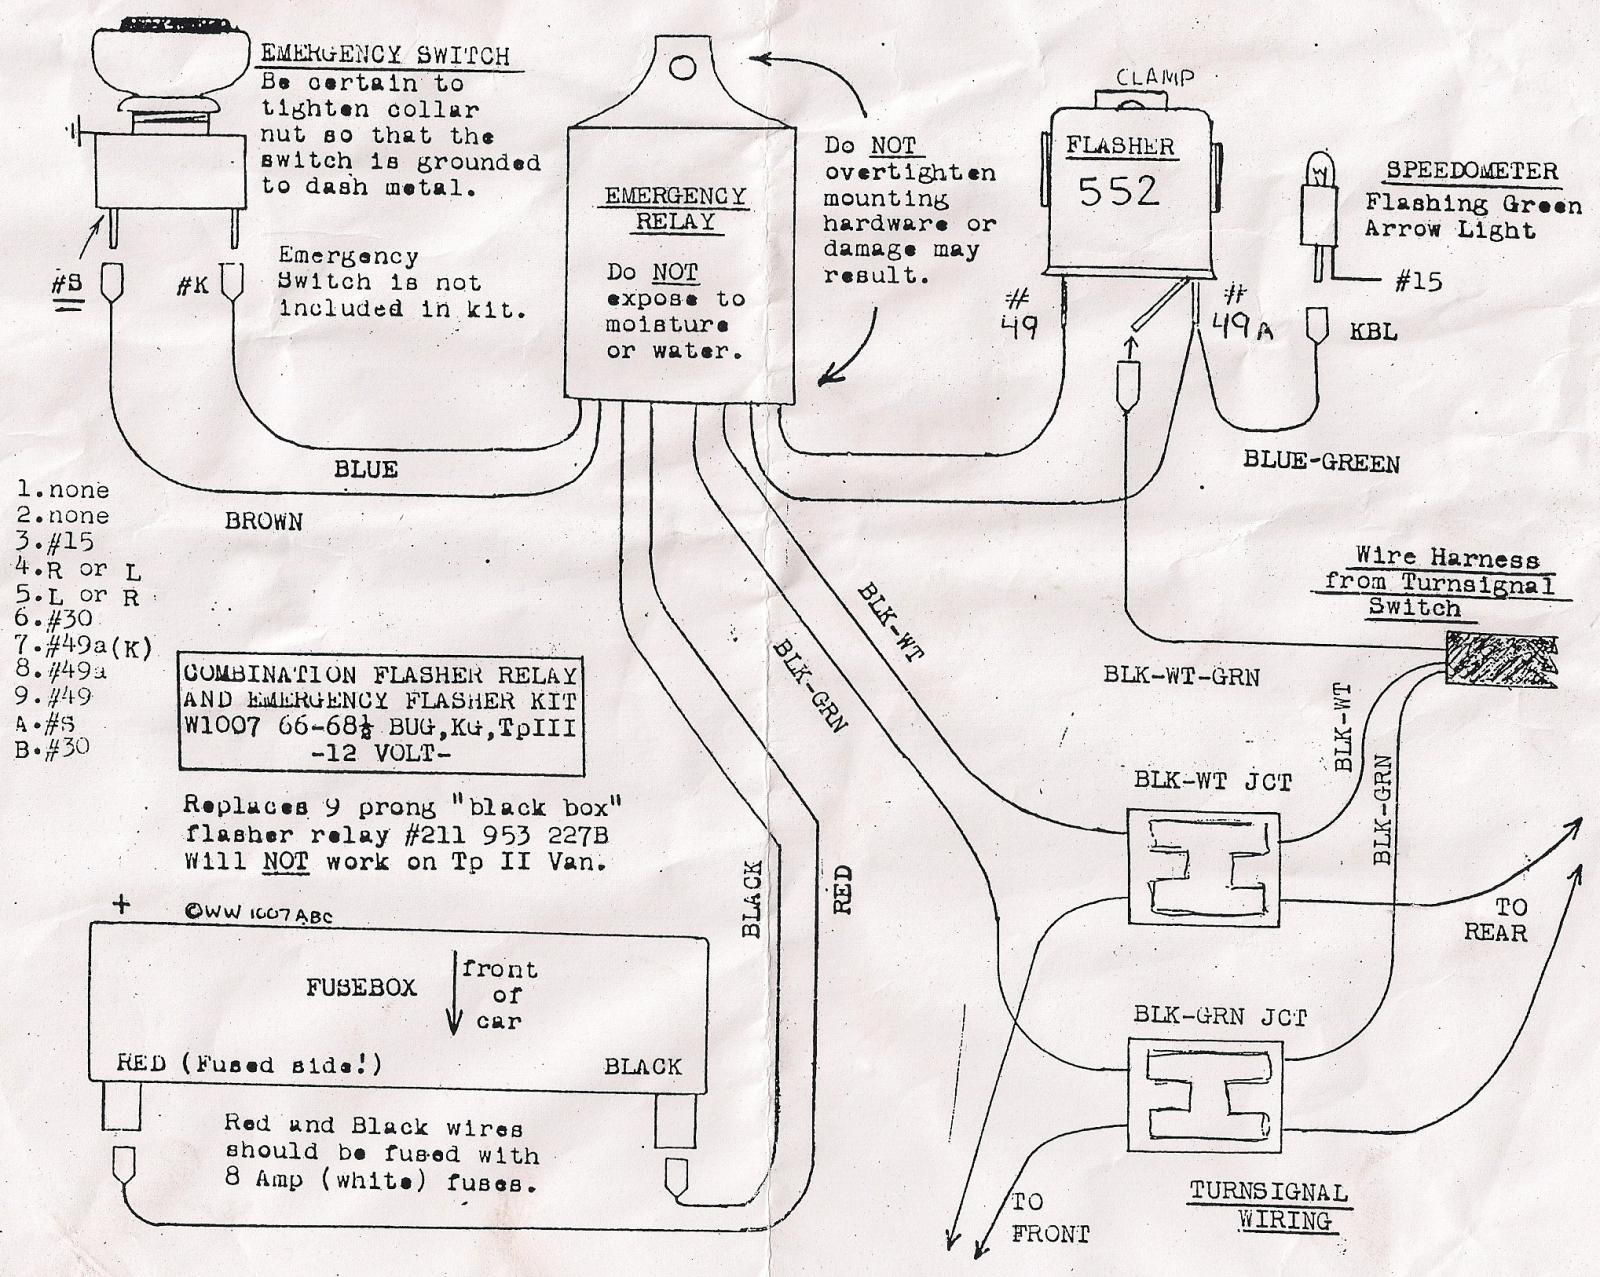 old home fuse box diagram circa 1958